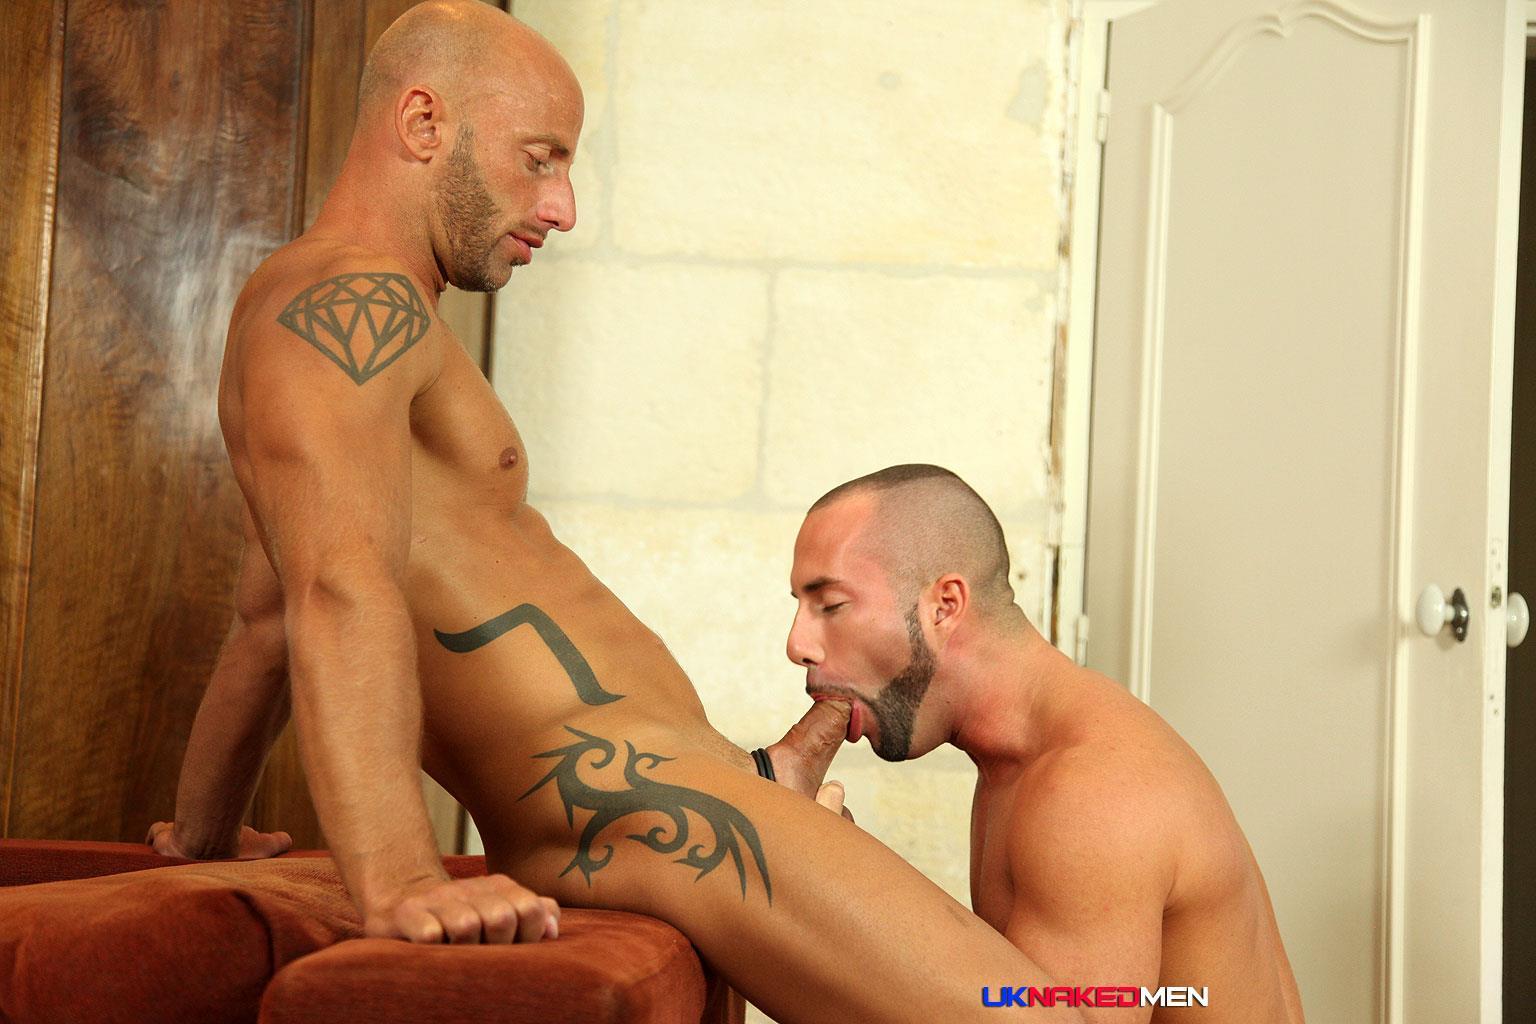 Hot gay men getting fucked